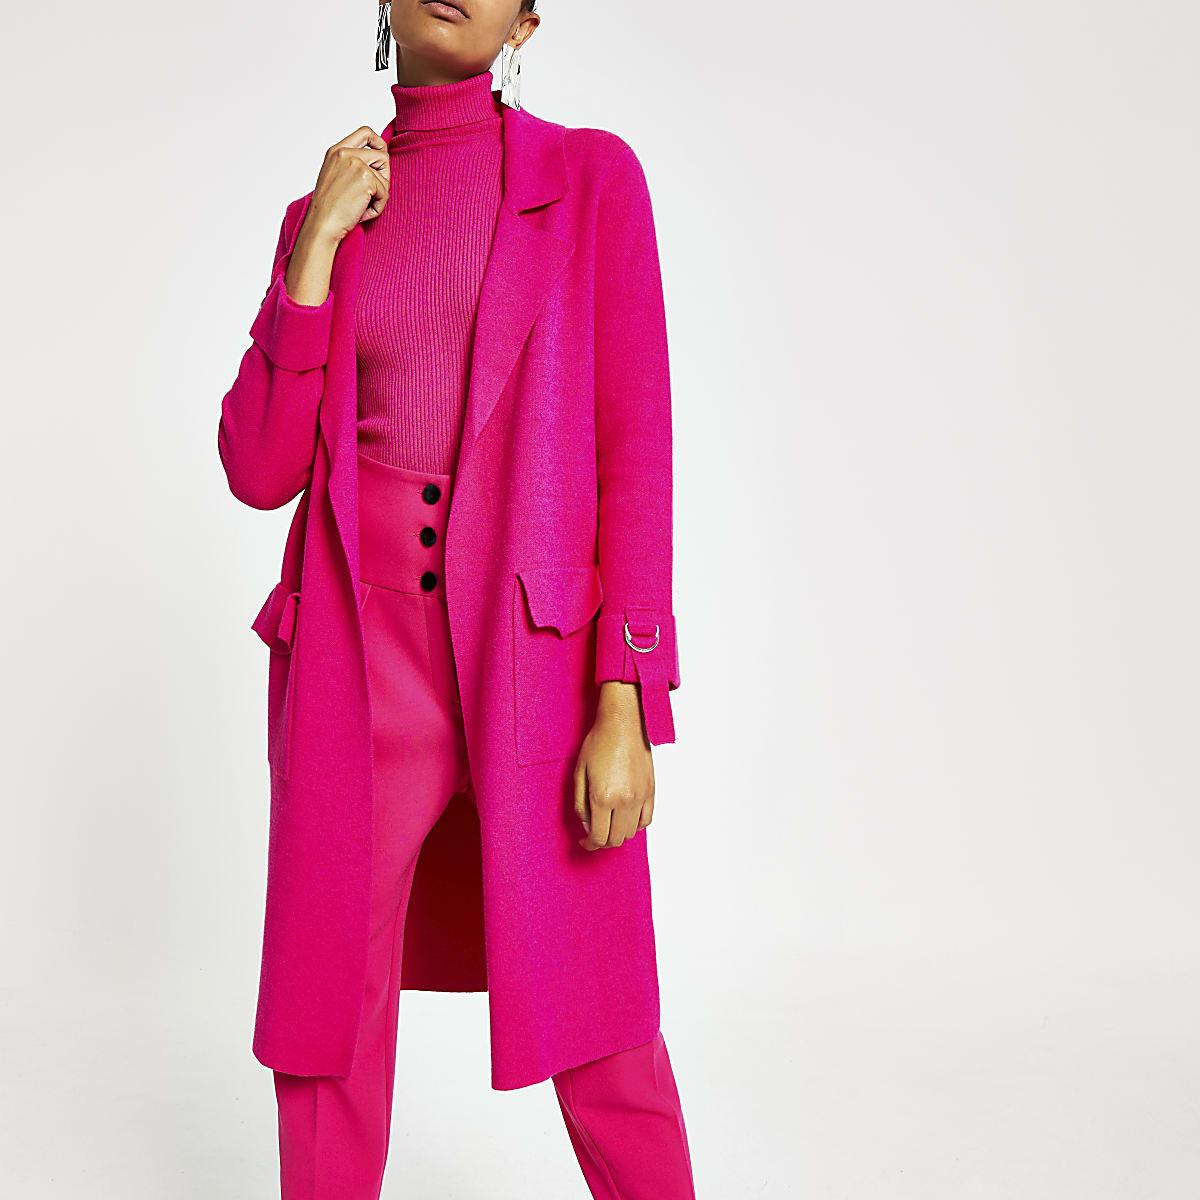 Veste longue en maille rose vif